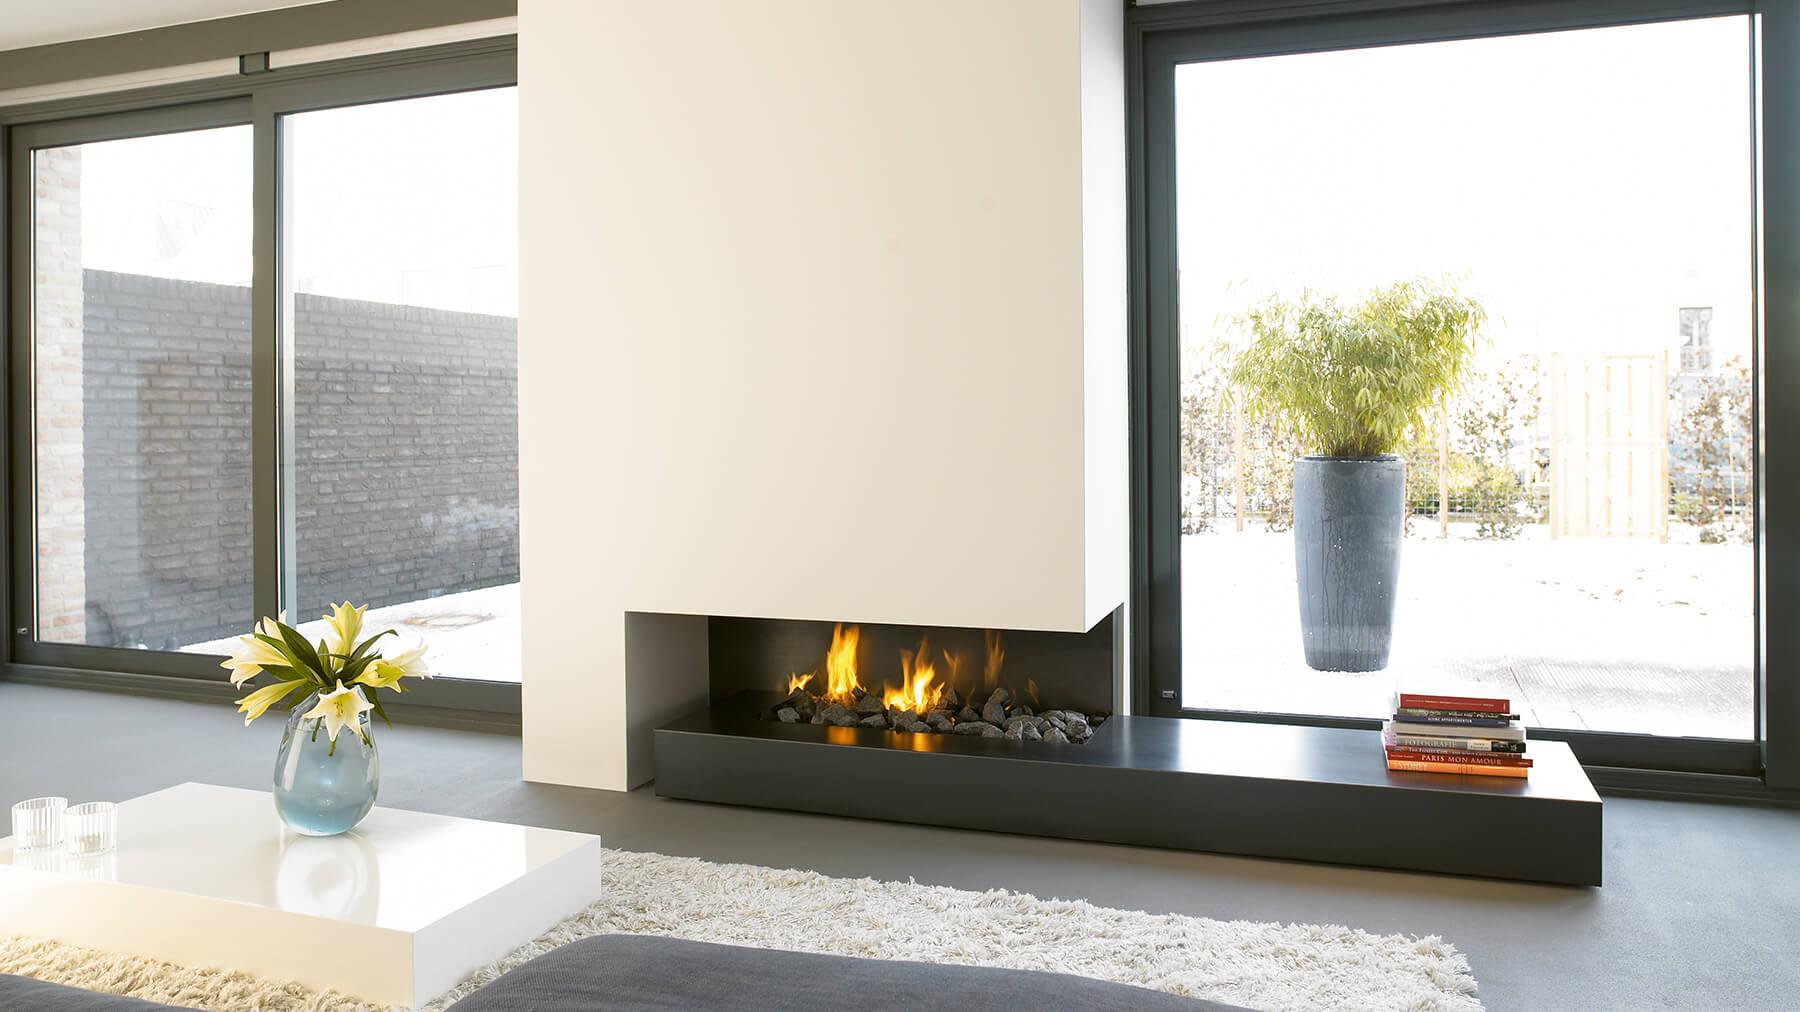 Bespoke fireplace i designer fireplace for Long modern fireplace